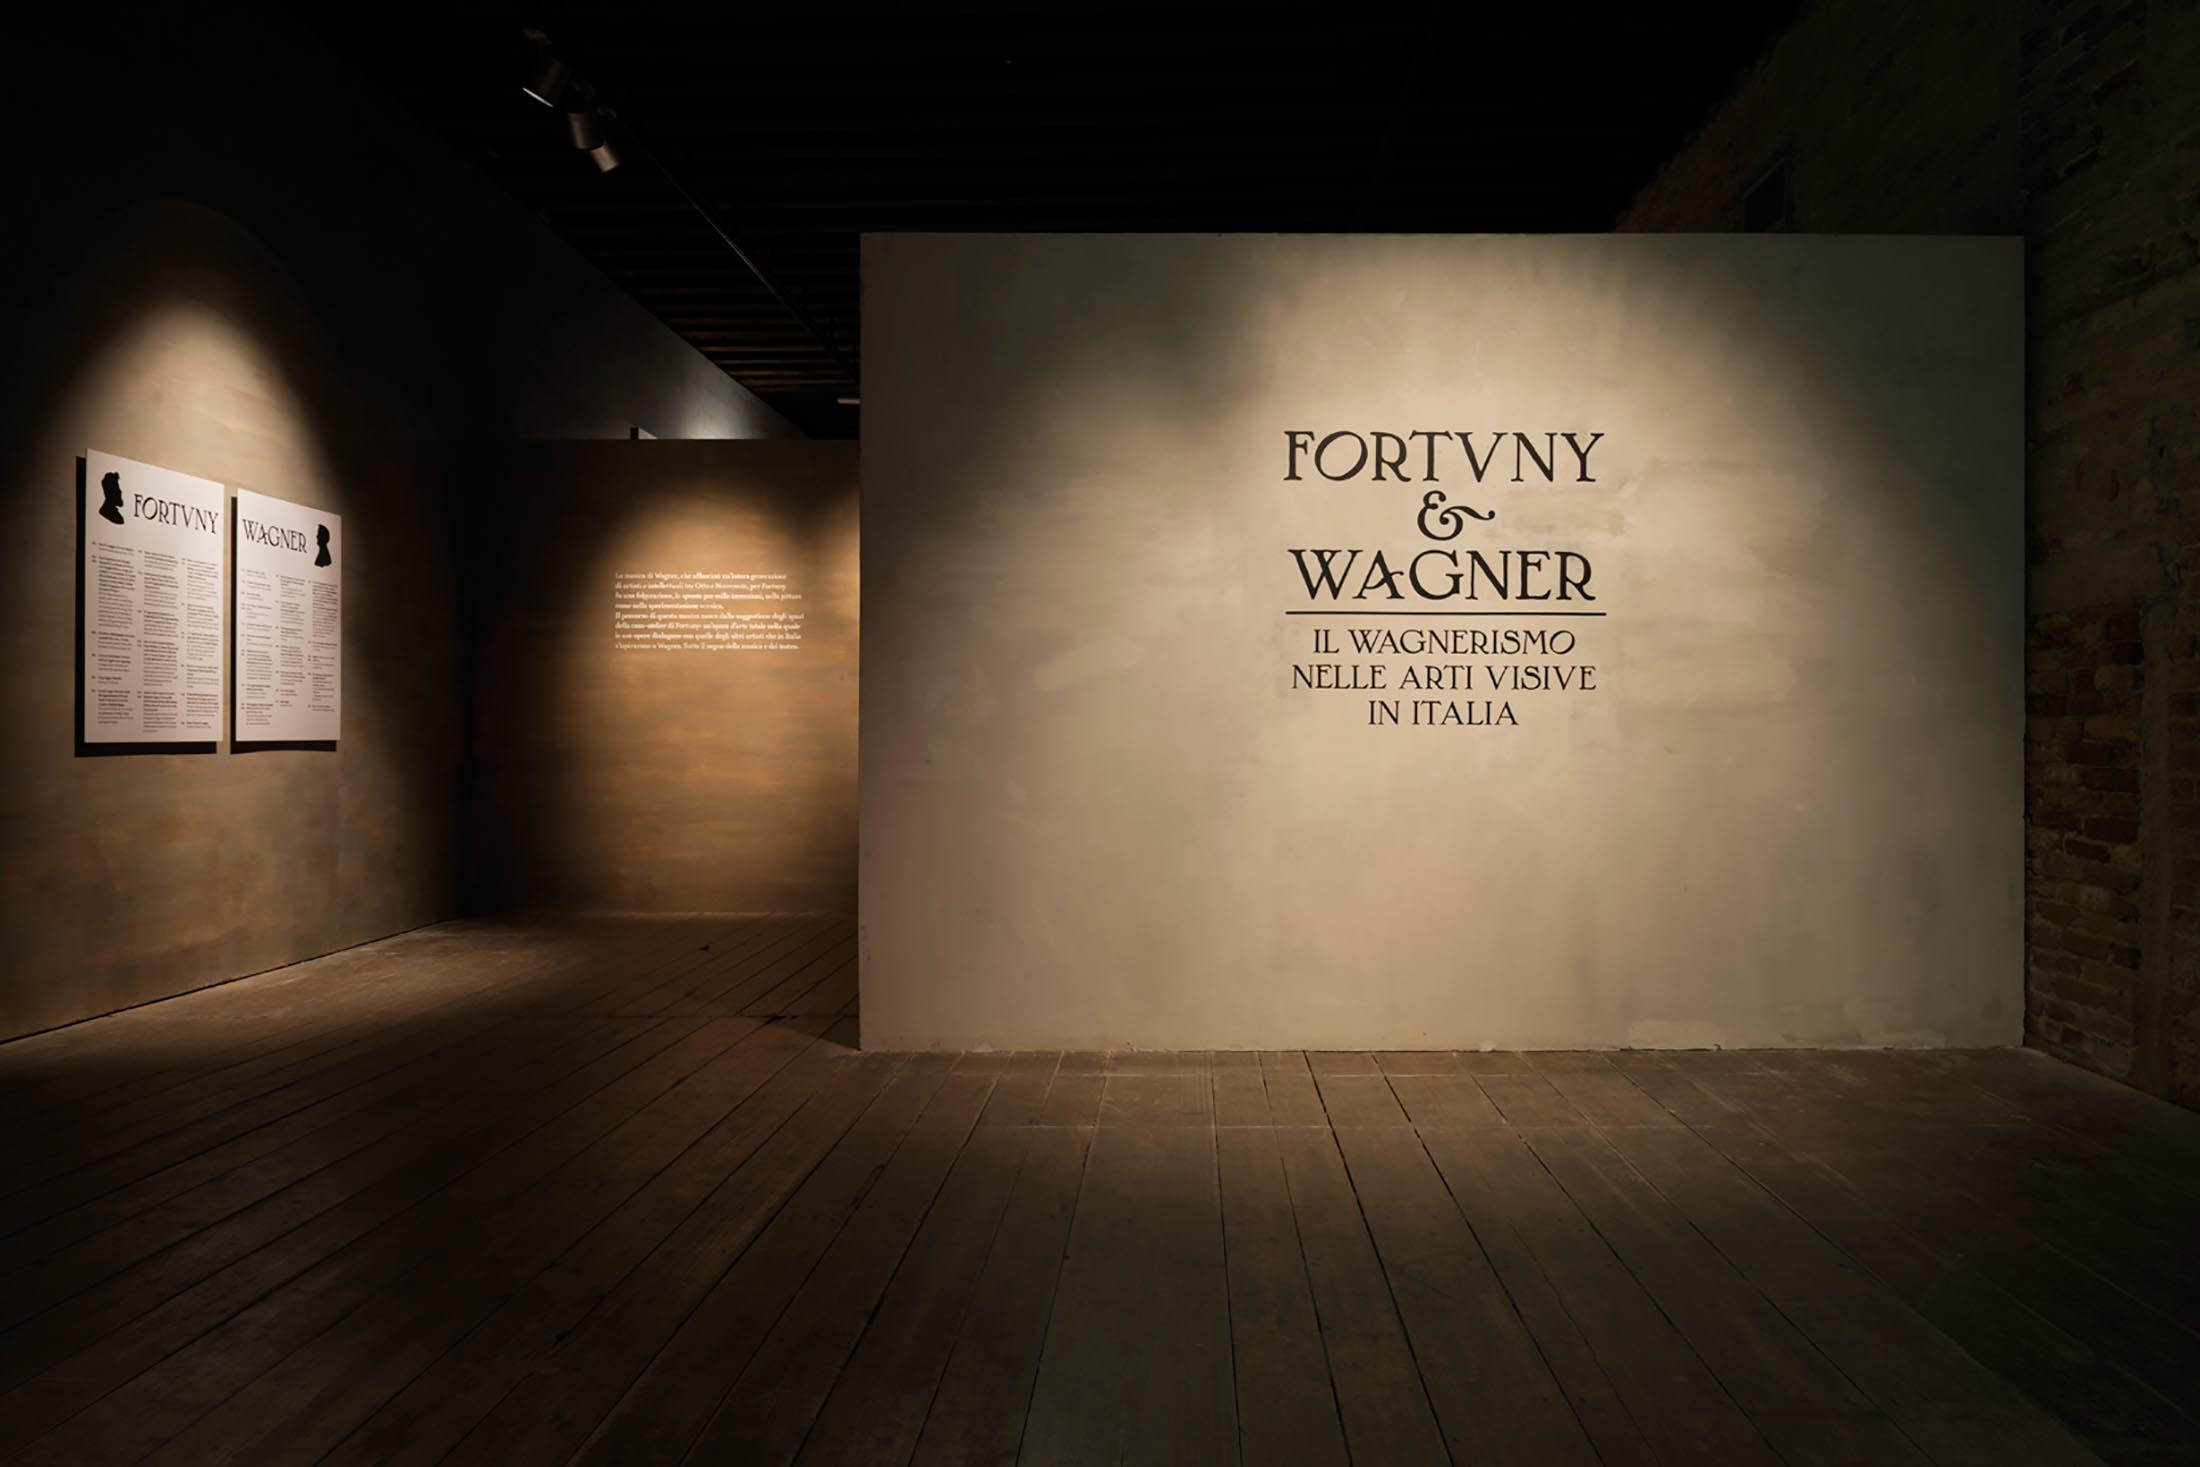 Fortuny & Wagner - ingresso mostra